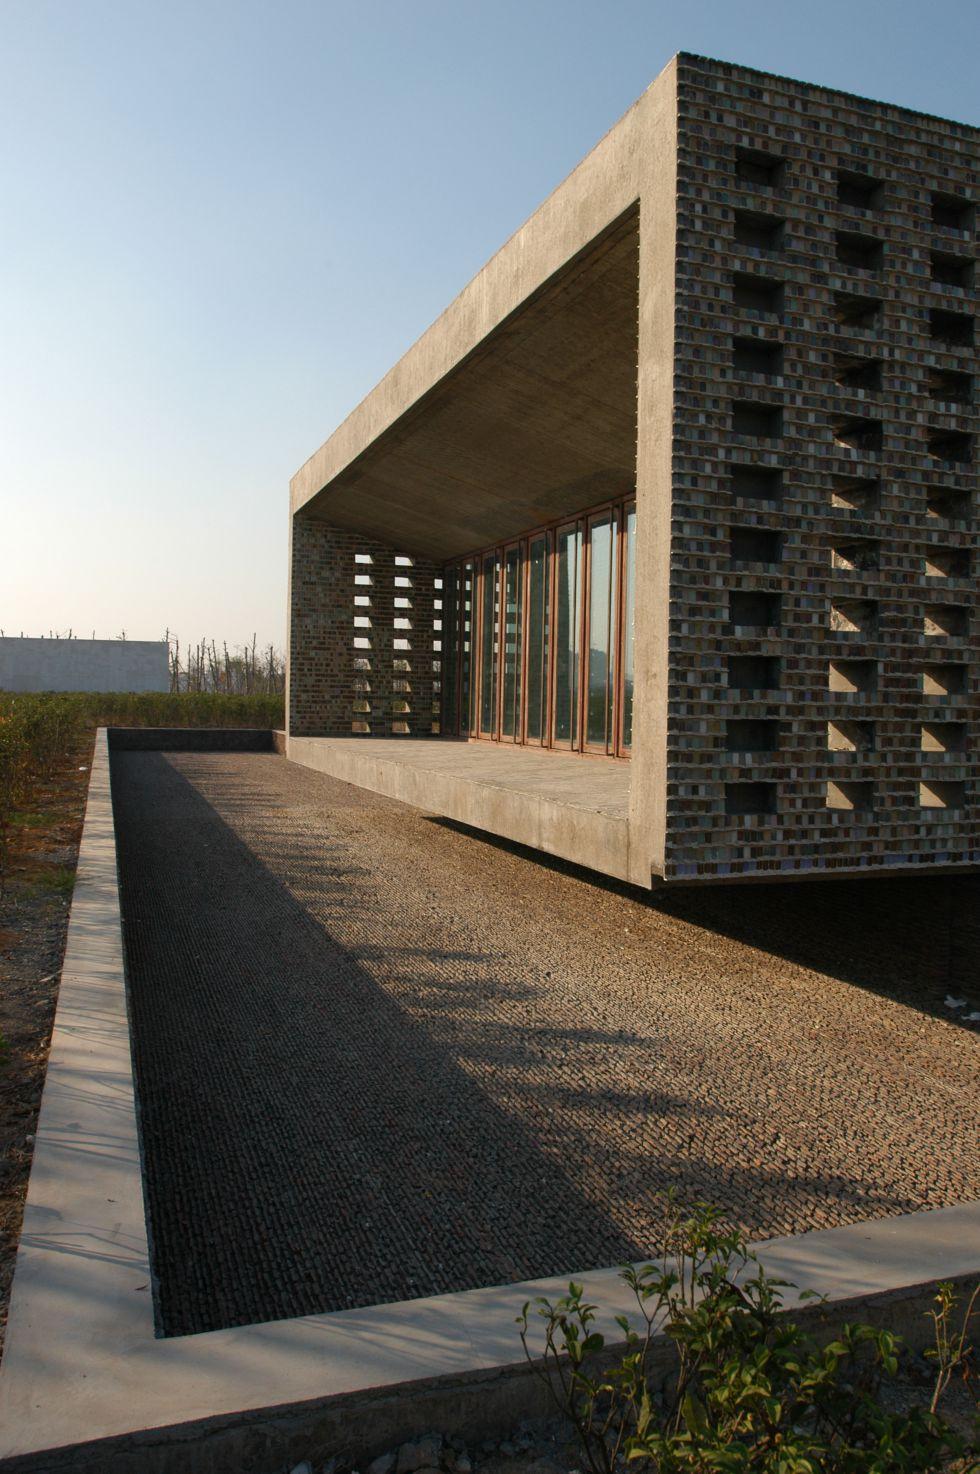 El Chino Wang Shu Gana El Premio Pritzker De Arquitectura | Cultura | EL  PAÍS